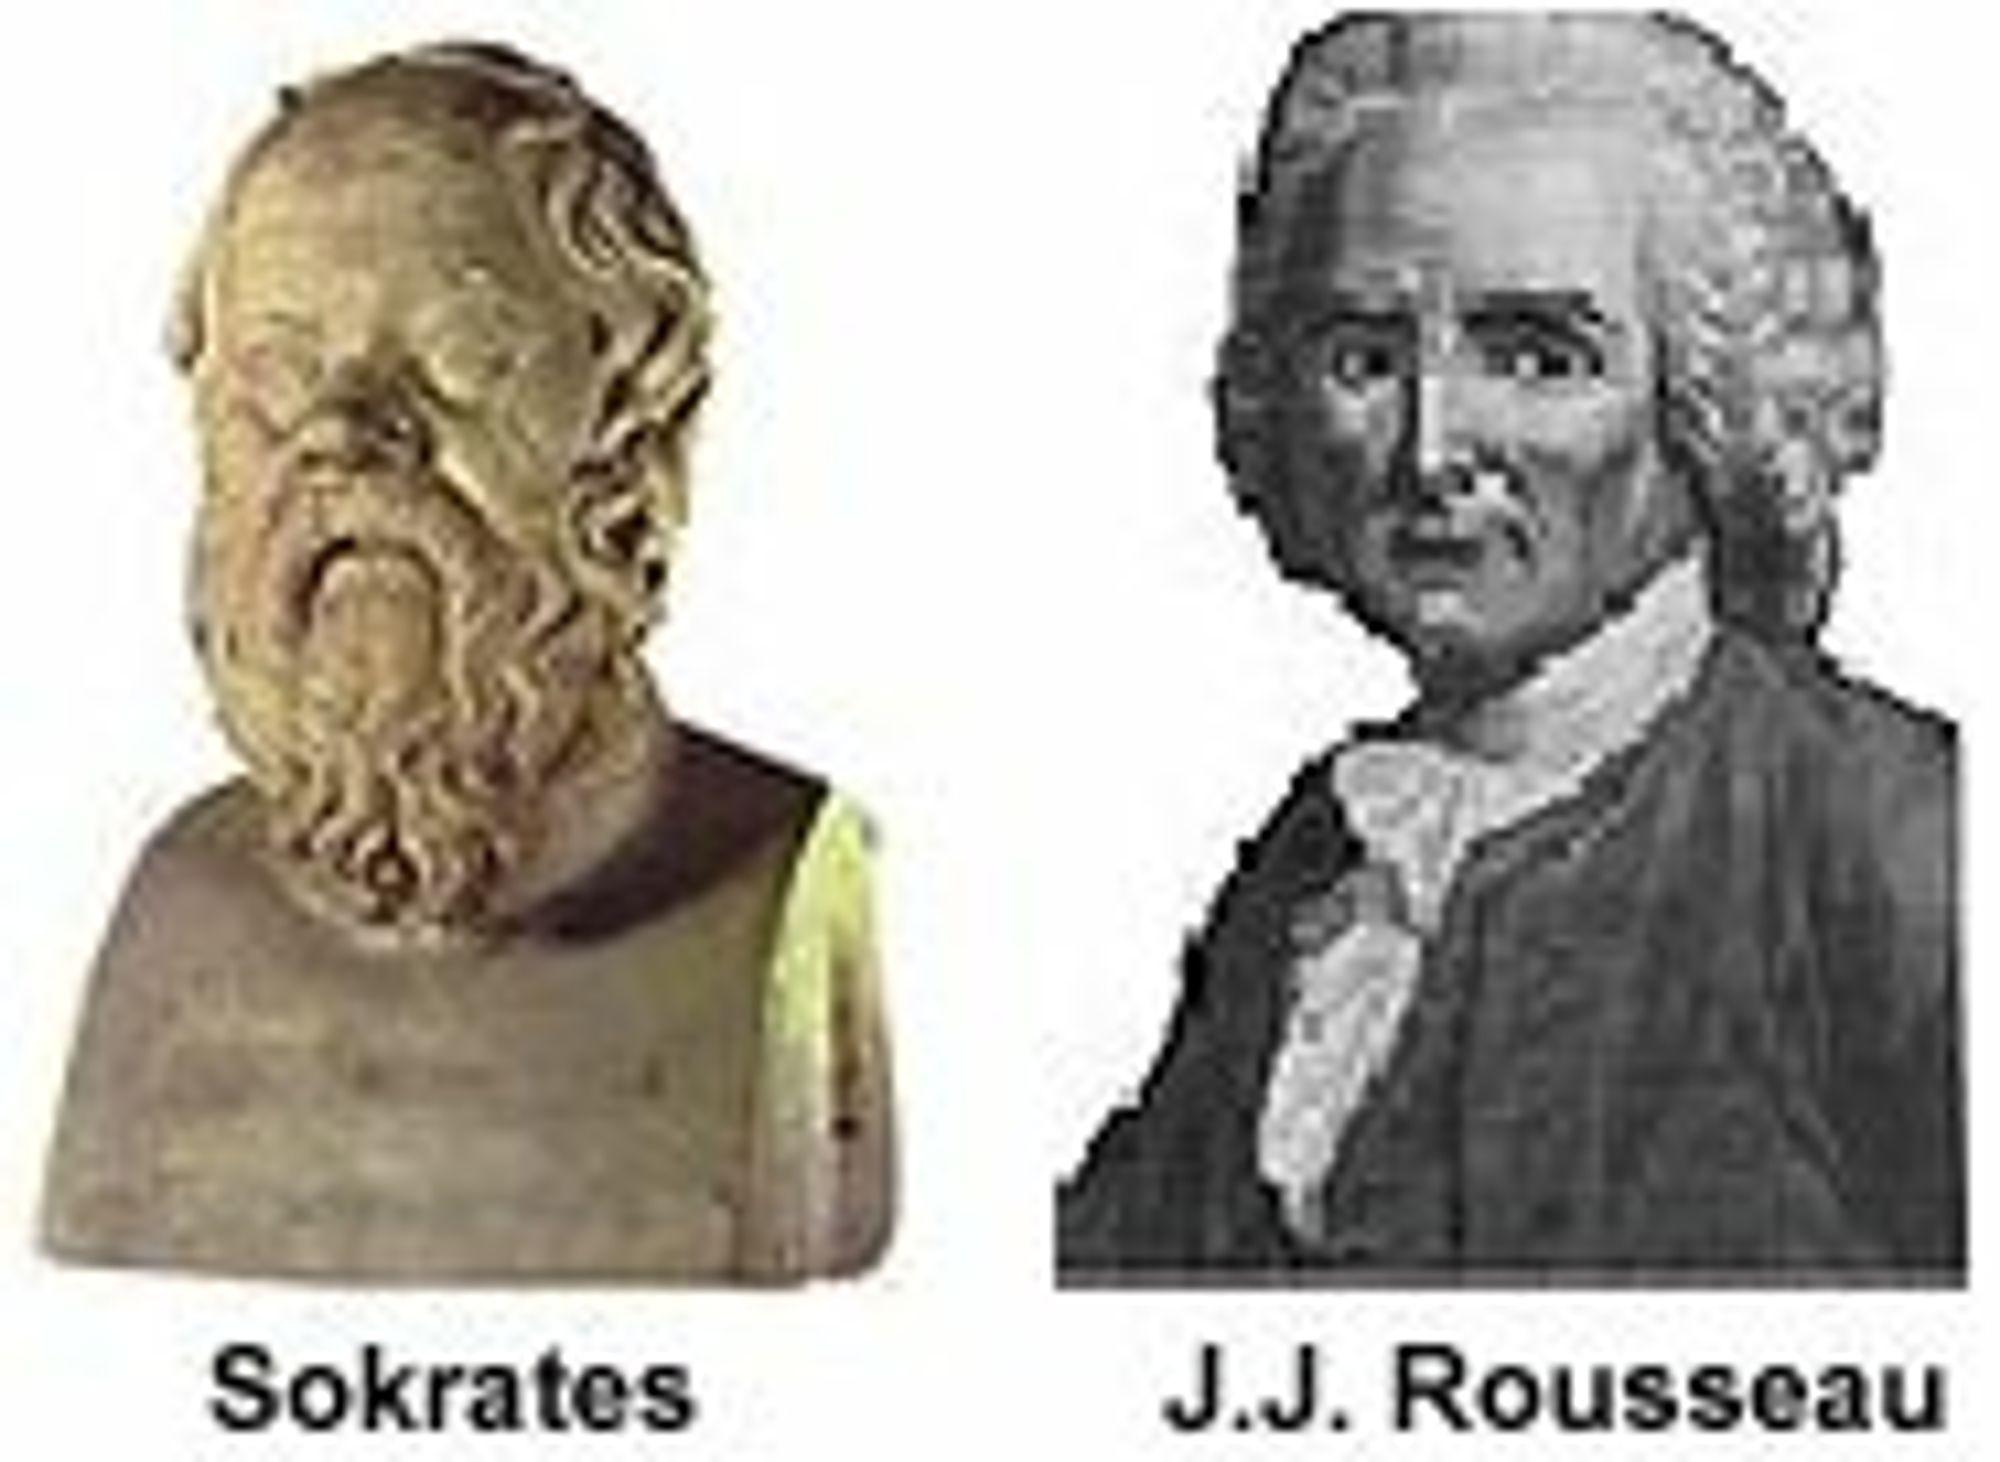 Filosofene Sokrates og J.J. Rousseau.